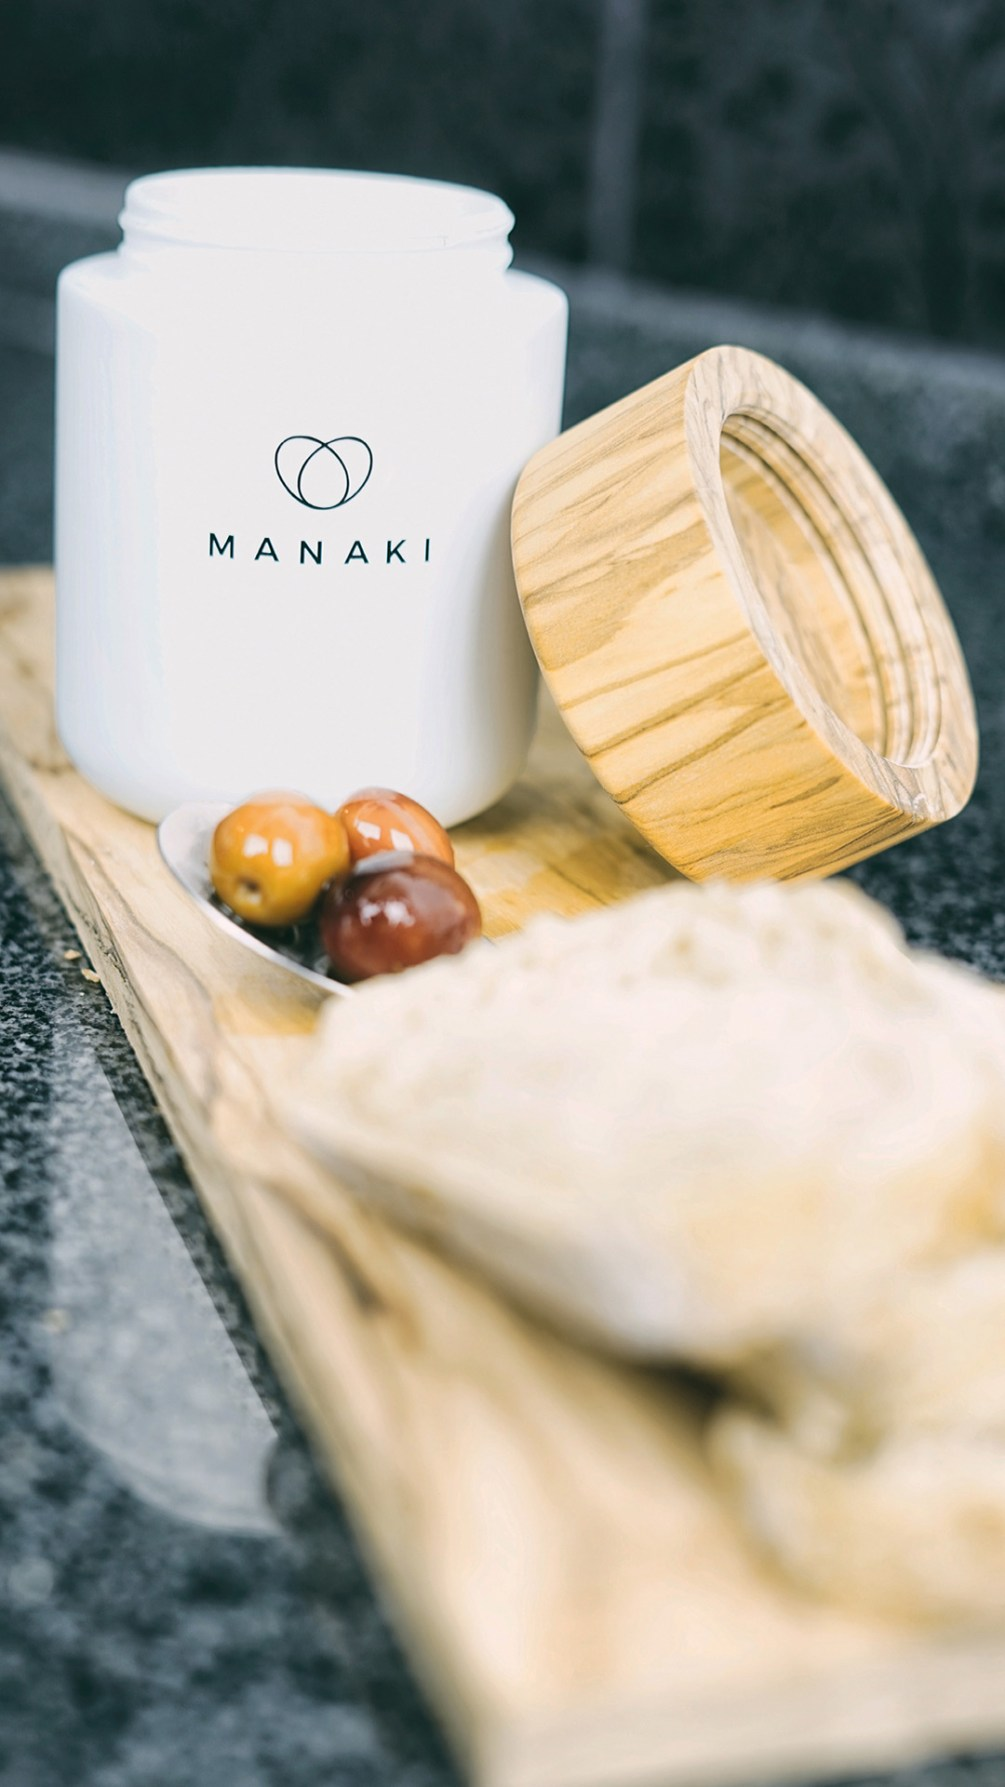 Manaki-Anwendung-Oliven